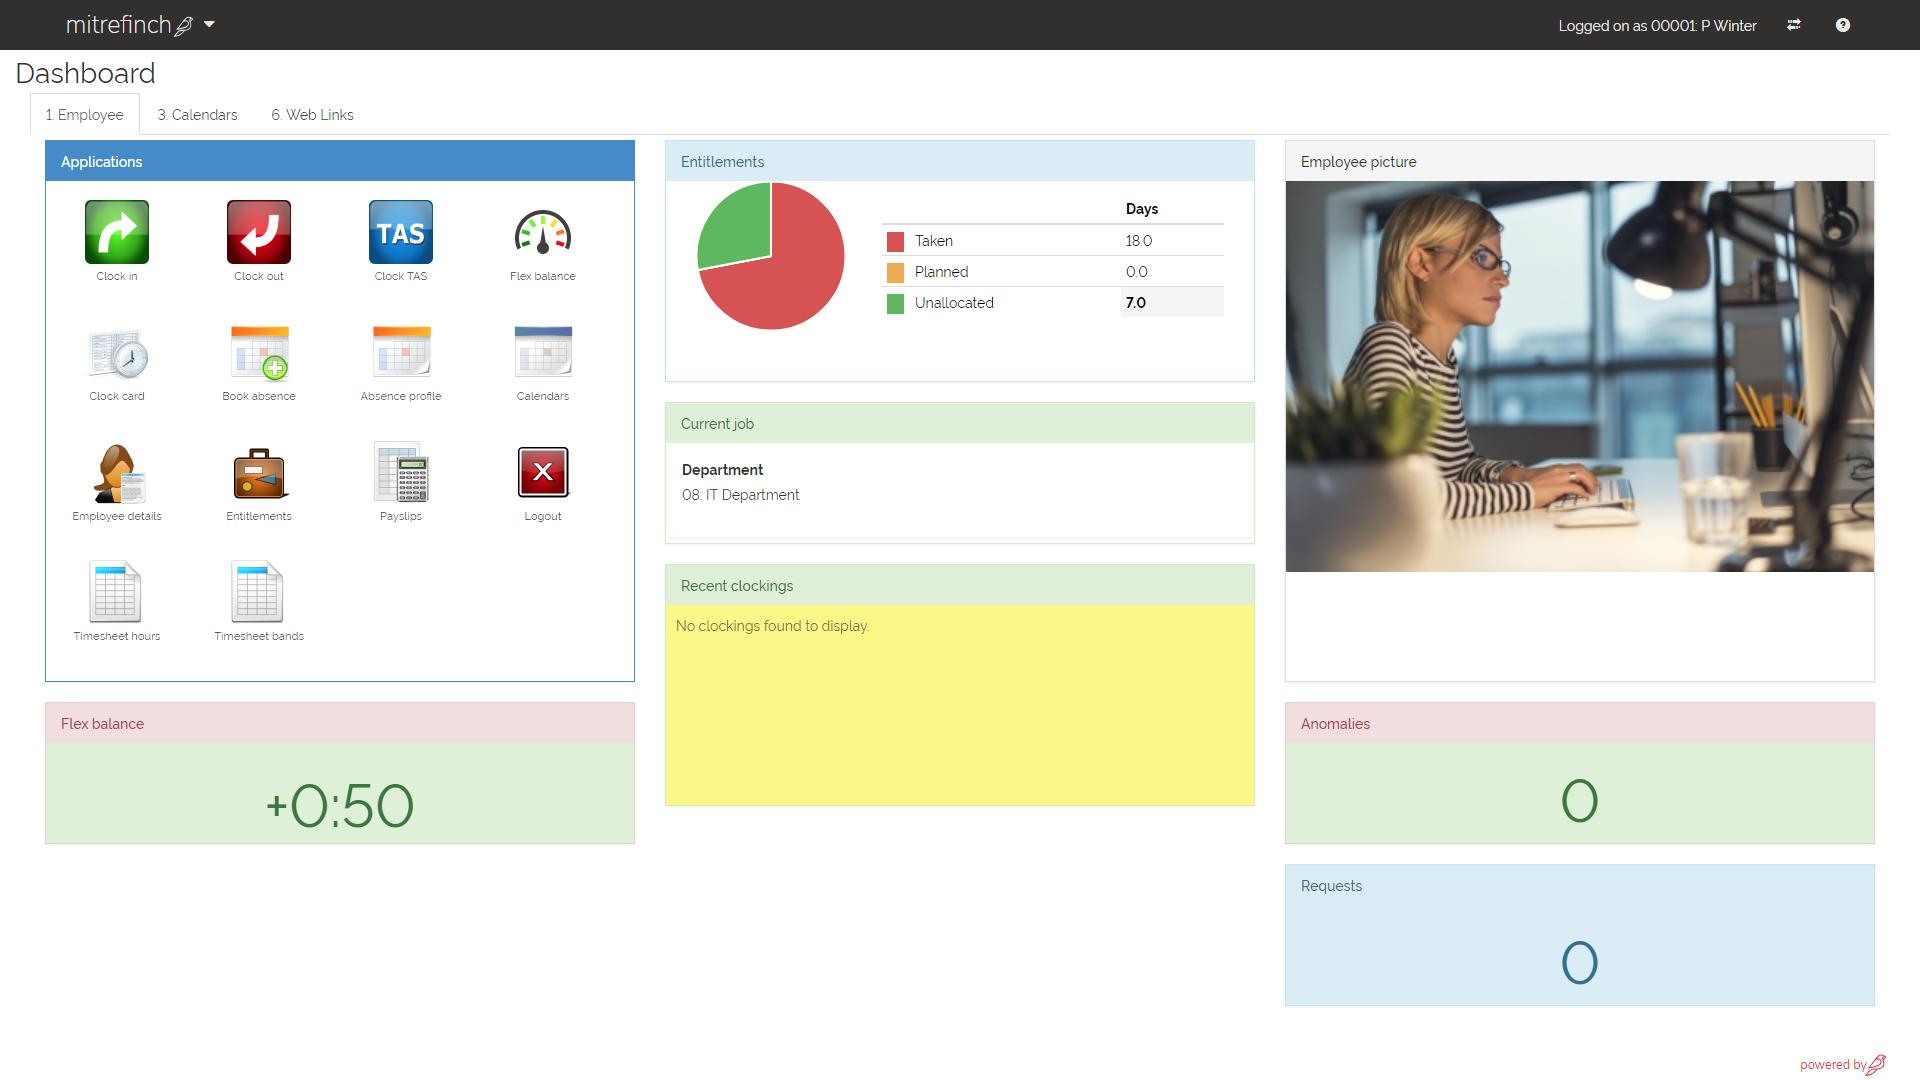 Mitrefinch Software - Employee dashboard